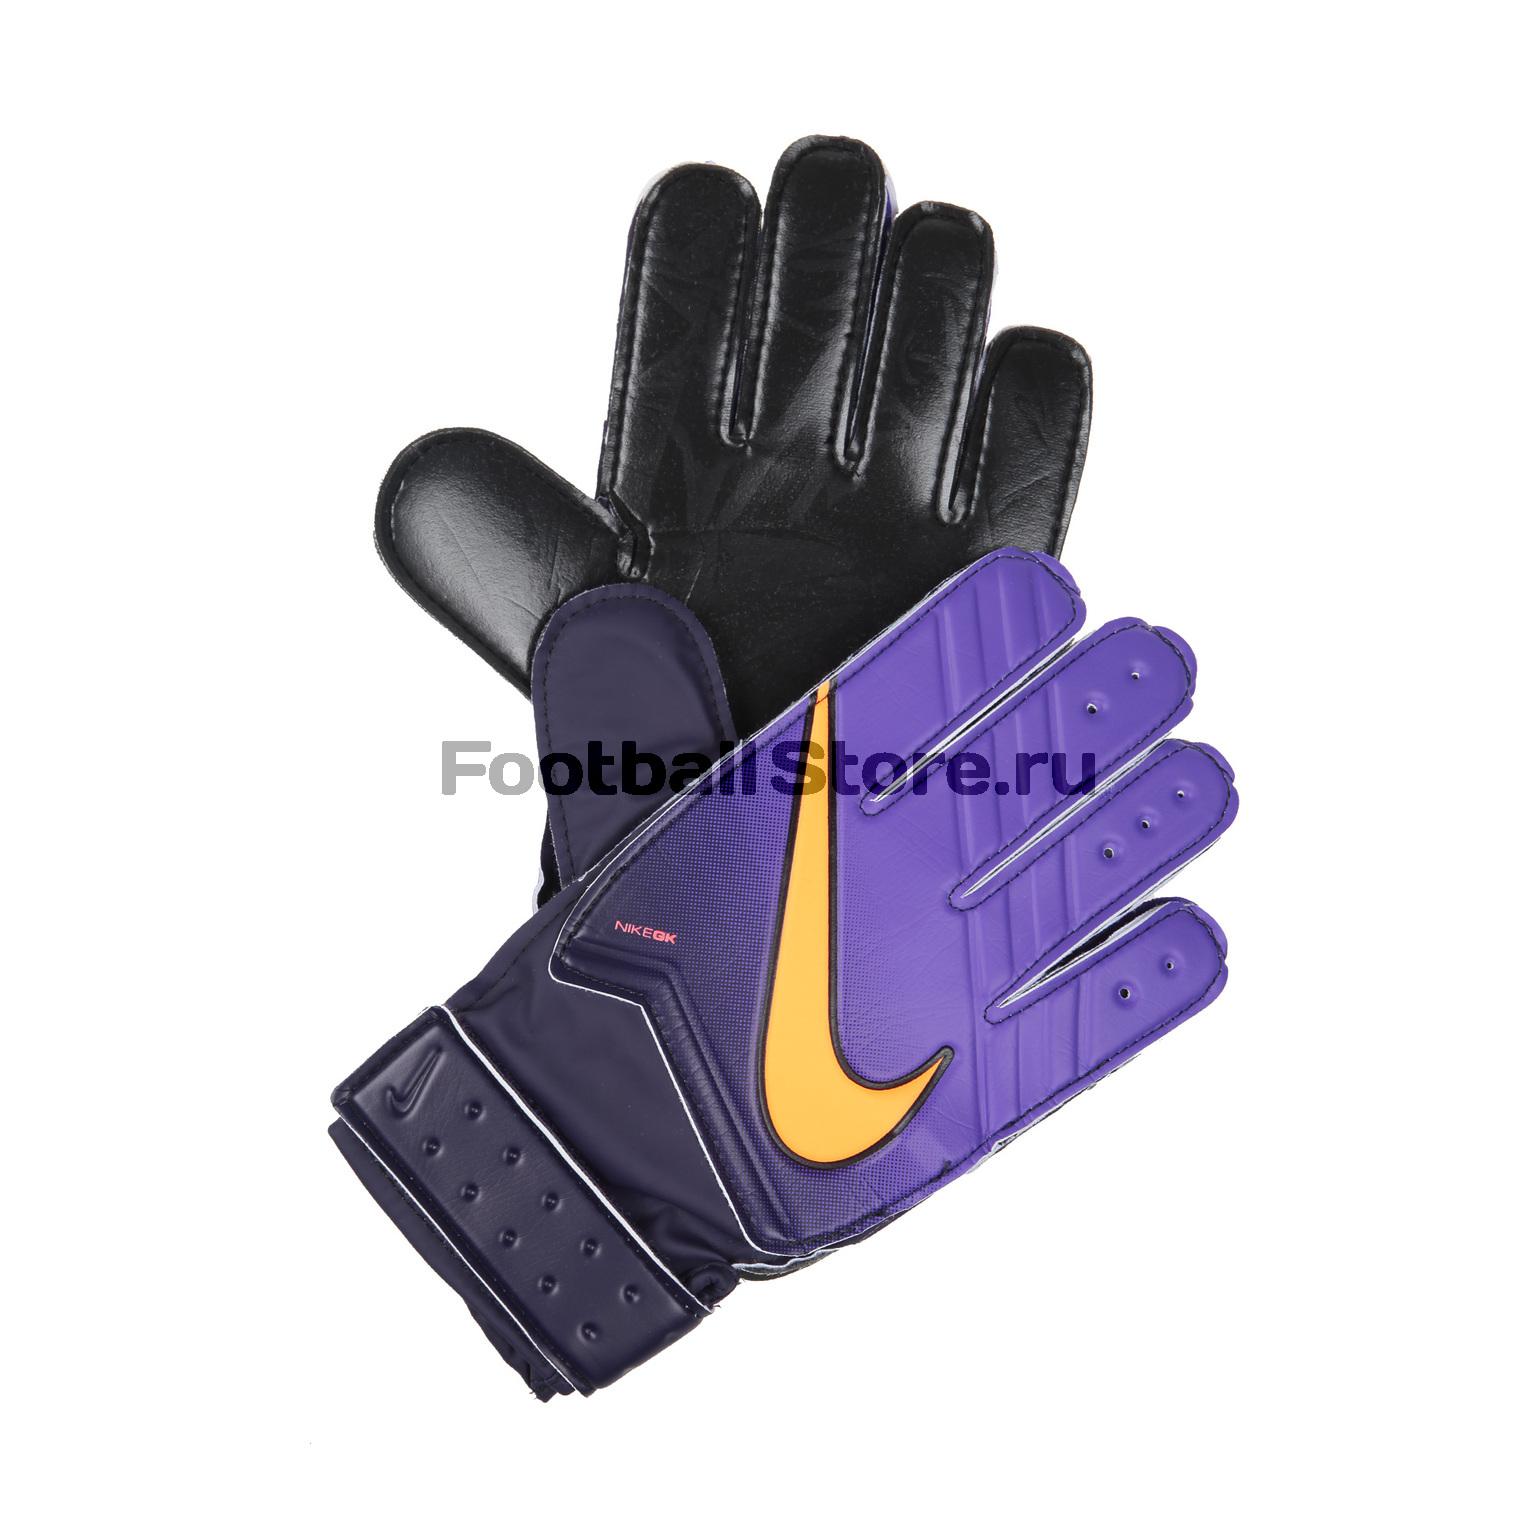 Перчатки вратарские детские Nike GK Match JR GS0331-560